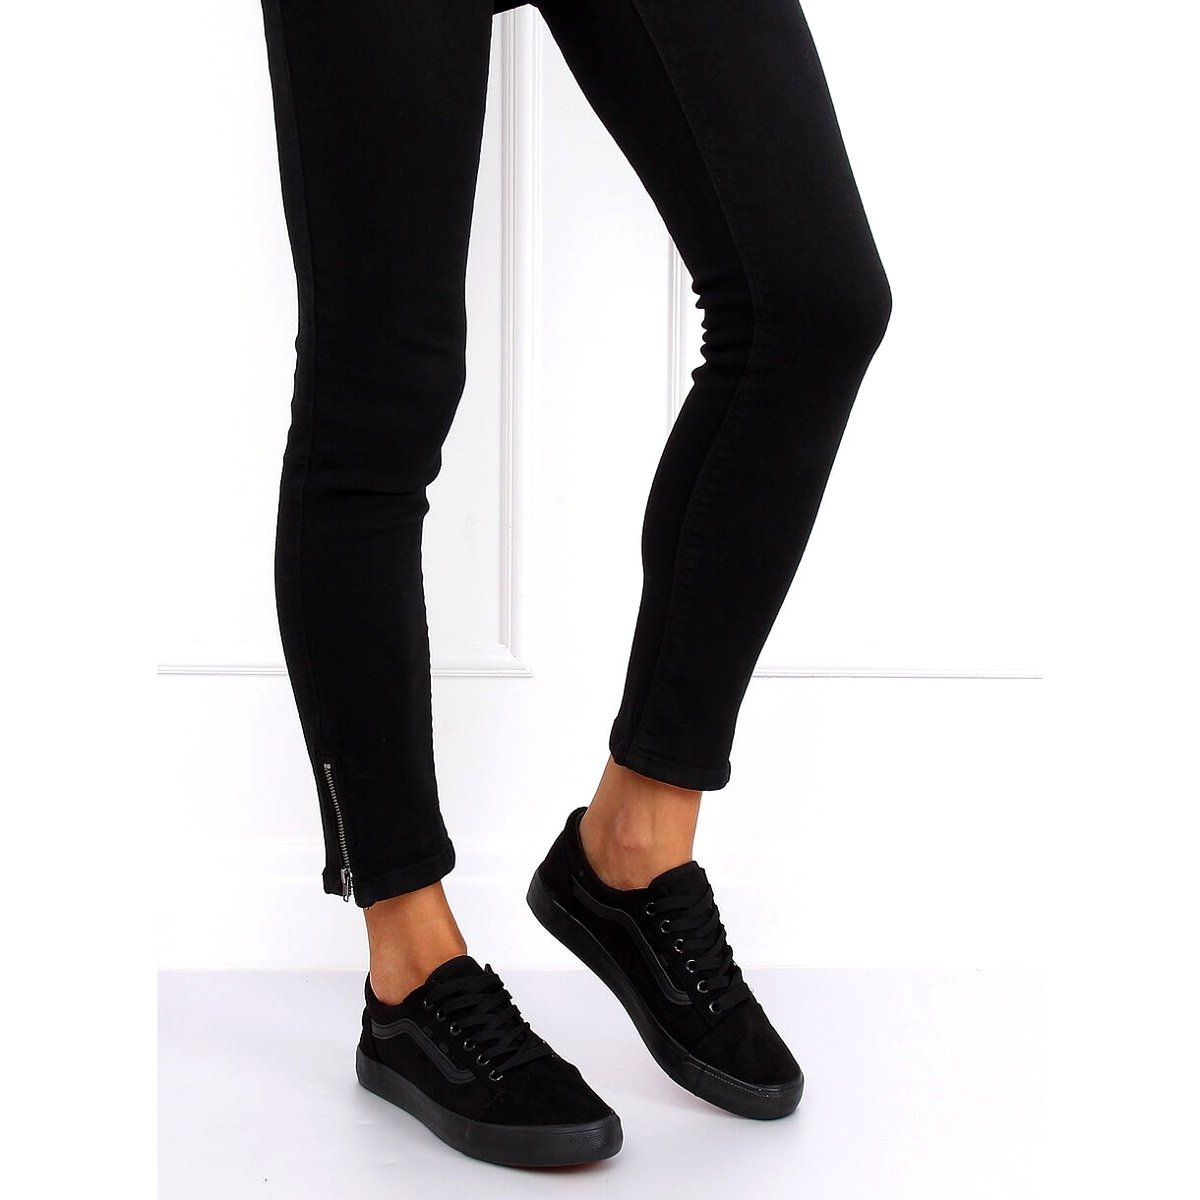 Trampki Damskie Czarne B70a Black Black Trainers Women Womens Sneakers Black Womens